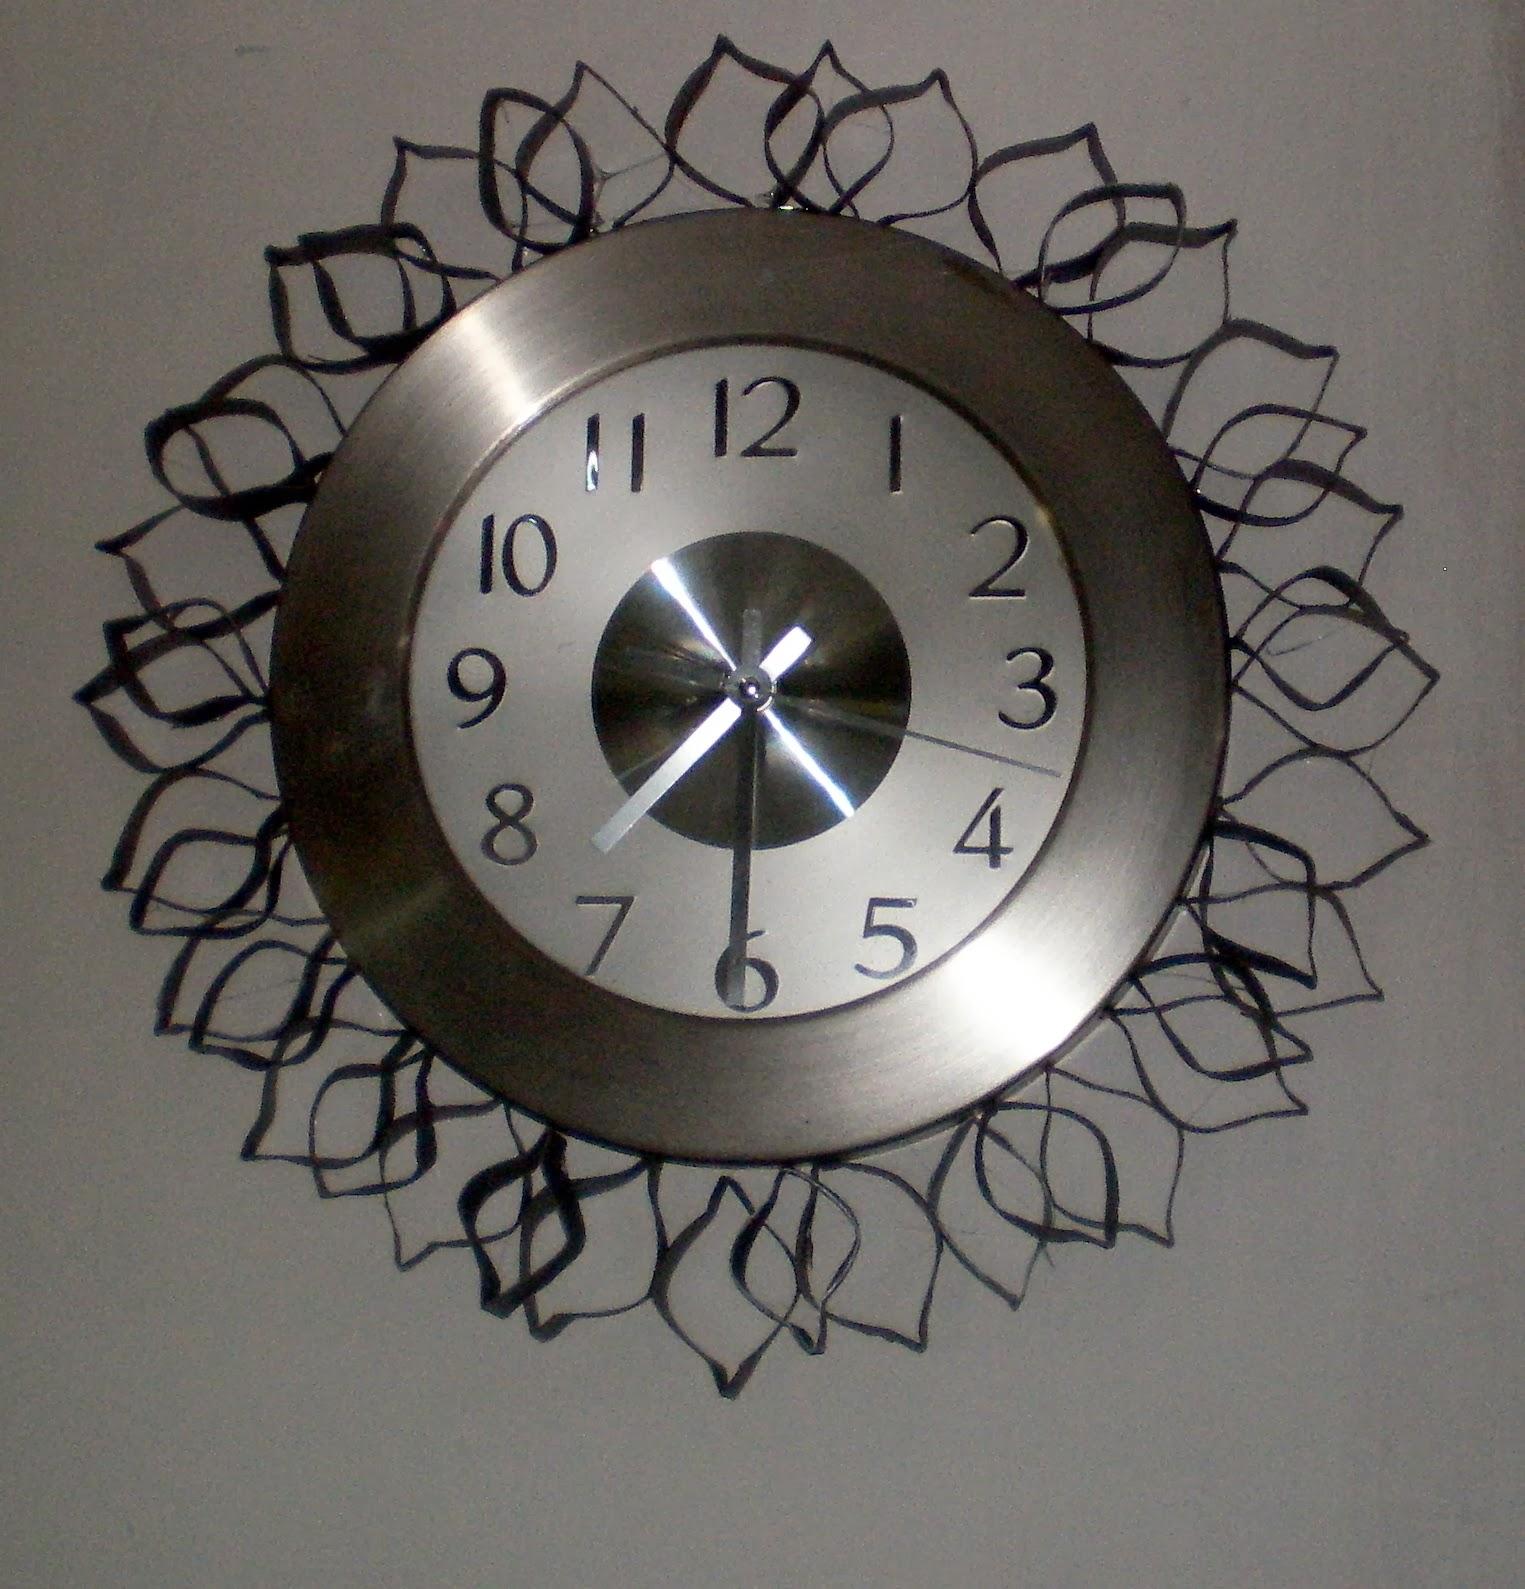 PROYECTOS DE CADA DÍA: Reloj con marco de aros de tubos de papel